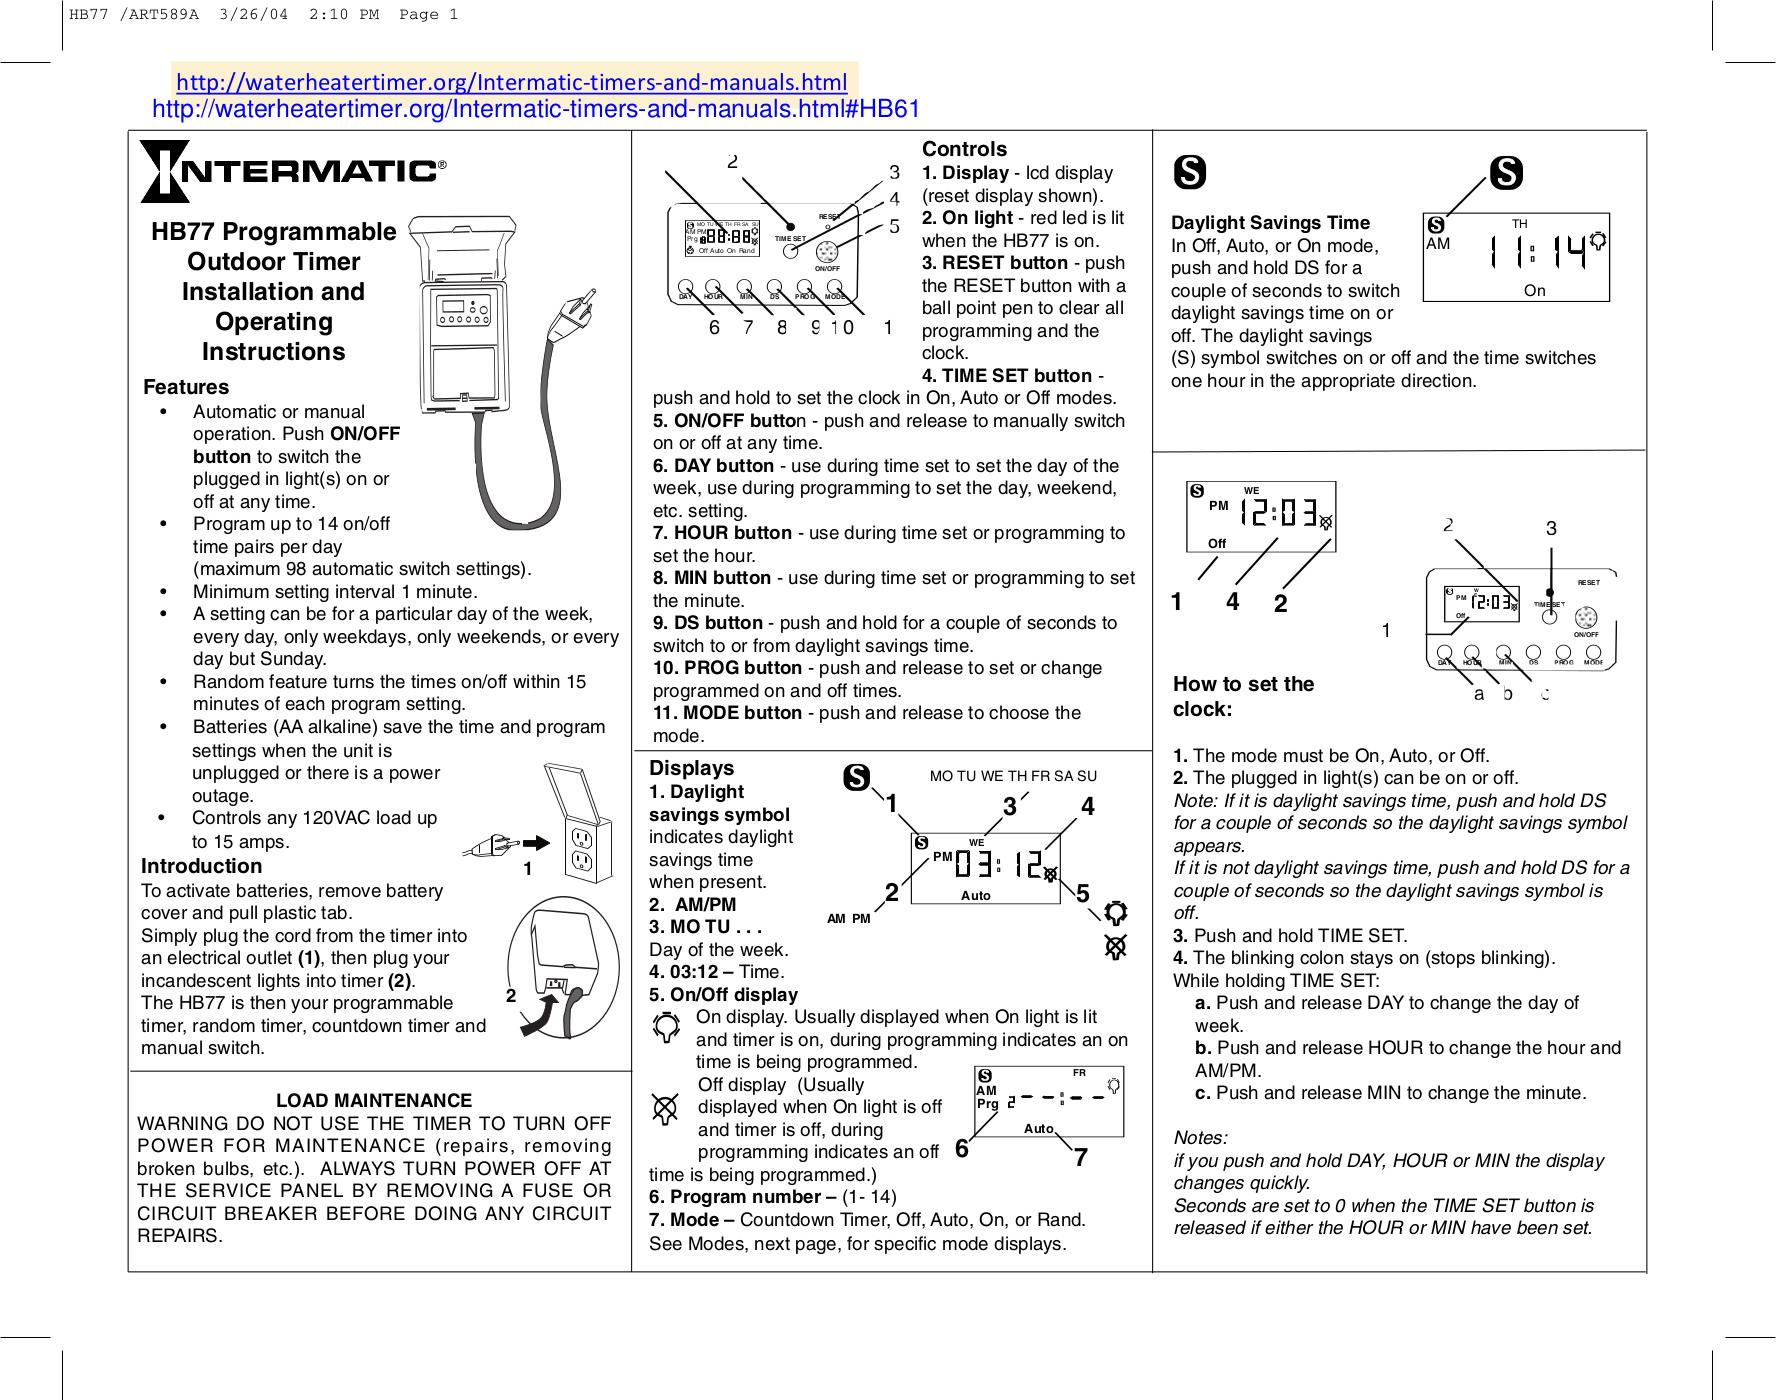 Intermatic hb77r.pdf 0 spa wiring diagrams catalina spa diagram wiring diagram ~ odicis catalina spa wiring diagram at bakdesigns.co